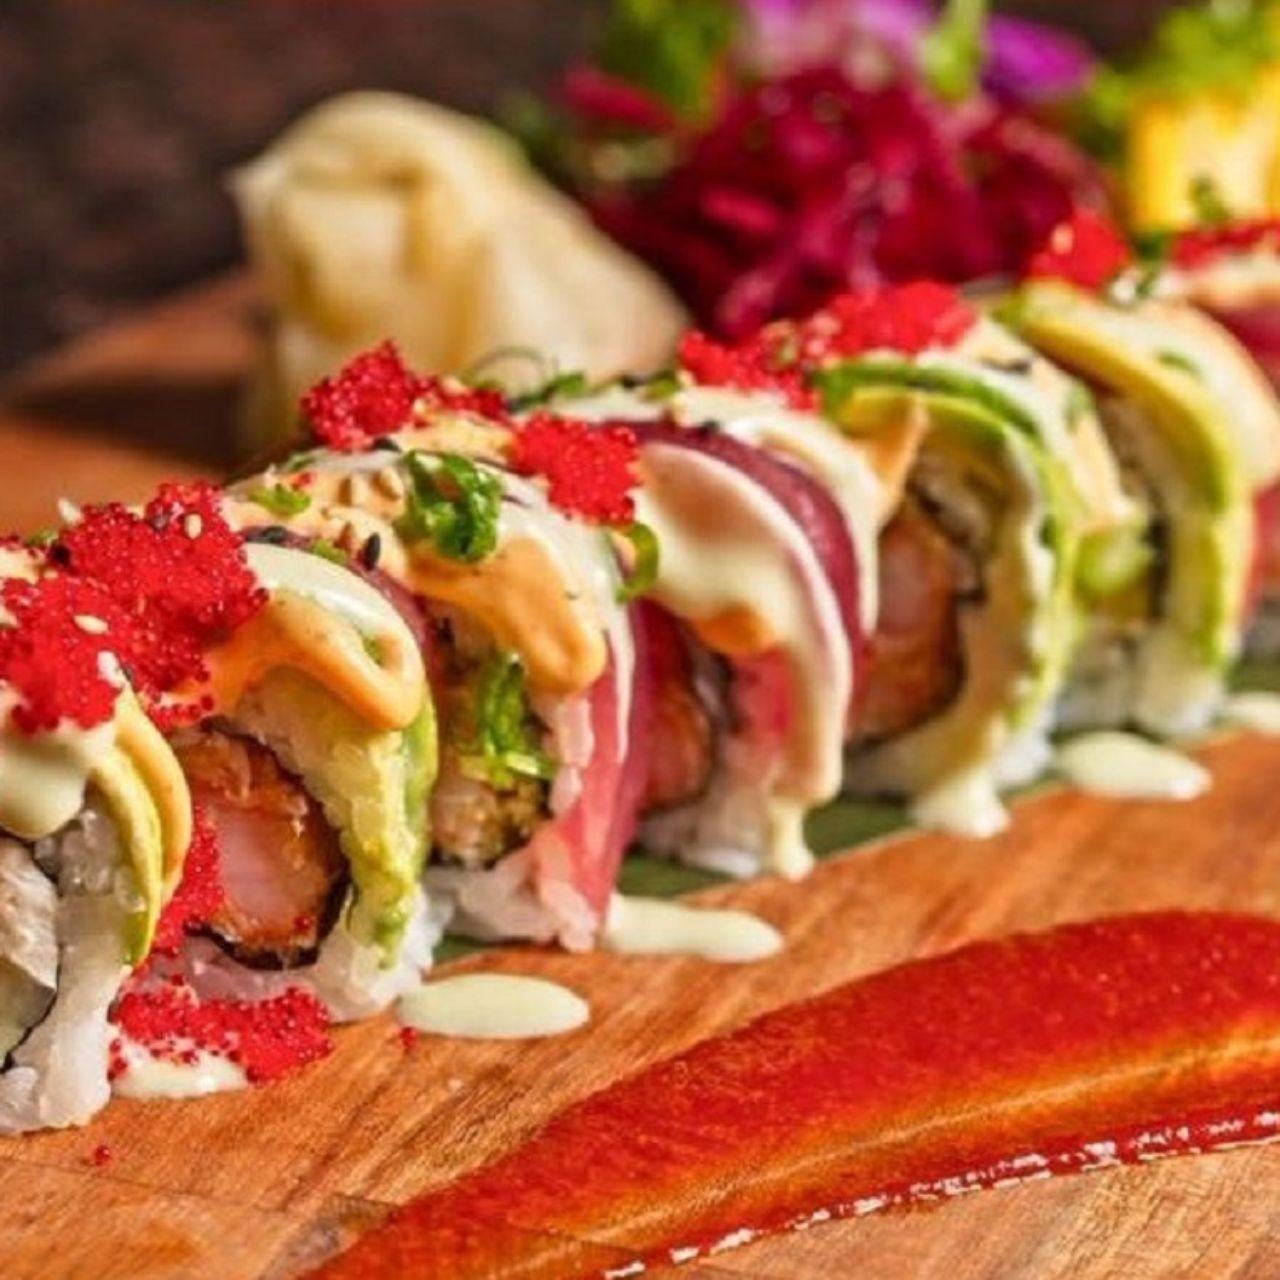 Origami Sushi Bar   Ponzu Sauce   Key West, FL   1280x1280